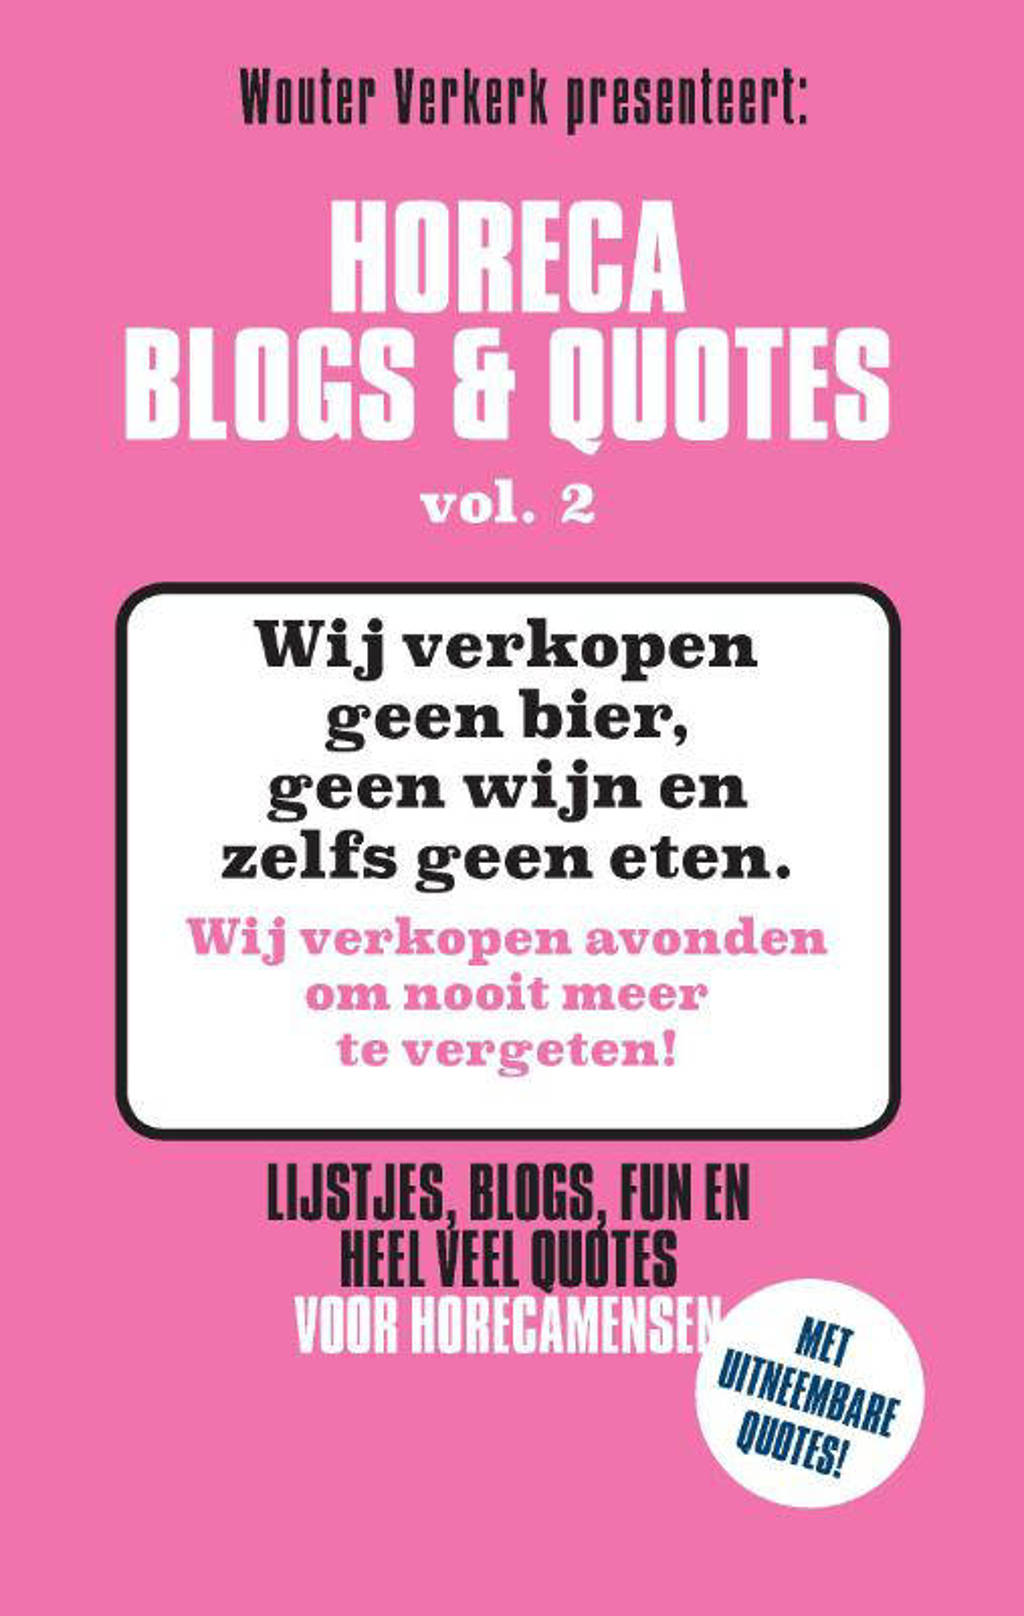 Horeca Blogs en Quotes: Horeca Blogs & Quotes vol. 2 - Wouter Verkerk